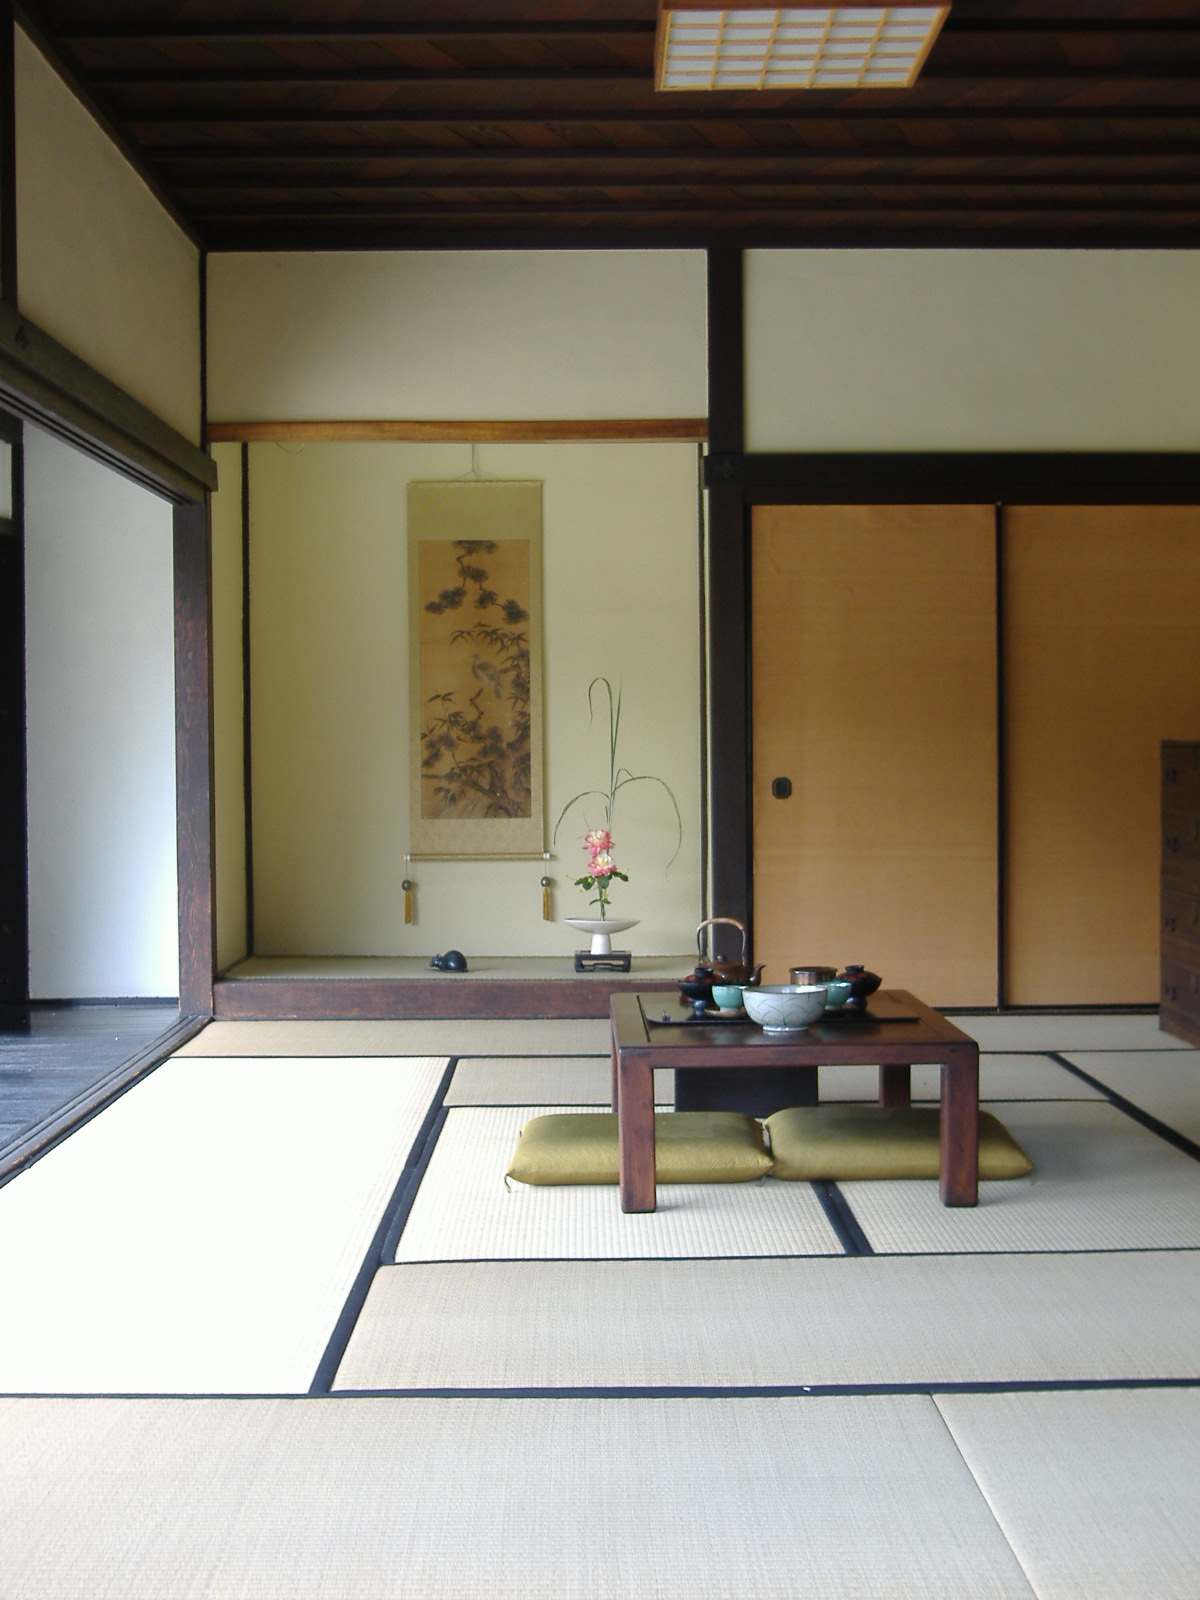 Japanese House: Dining Room By Gamefan23 On DeviantArt